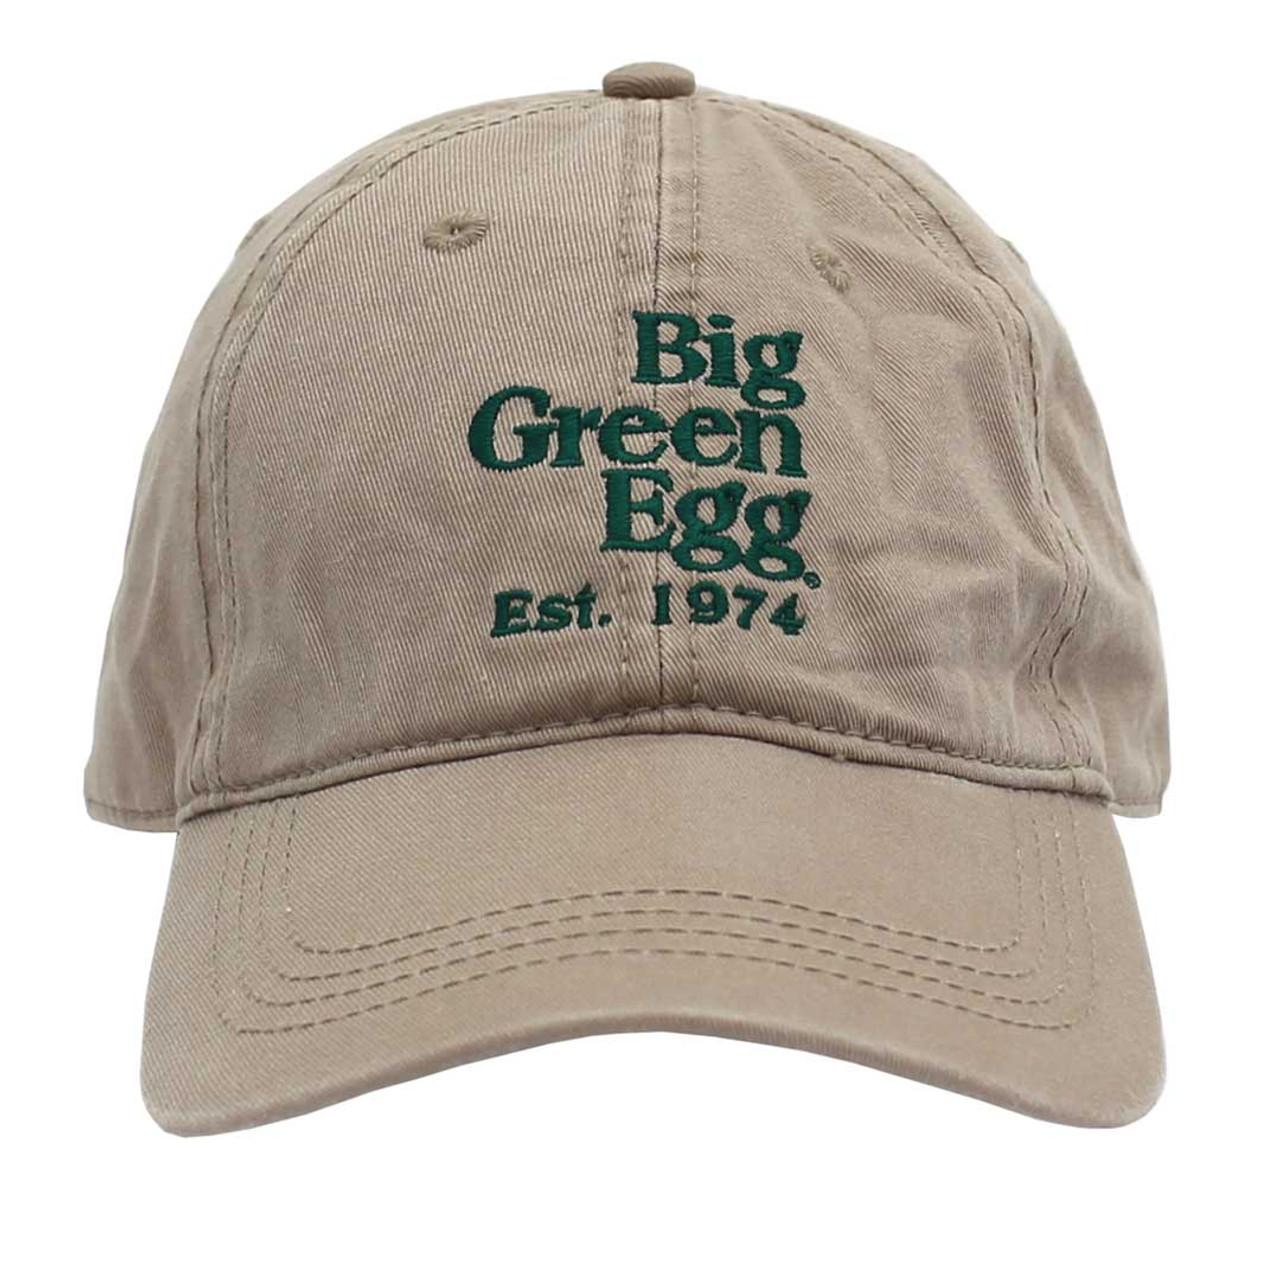 Big Green Egg Relaxed Est. 1974 Cap – Khaki